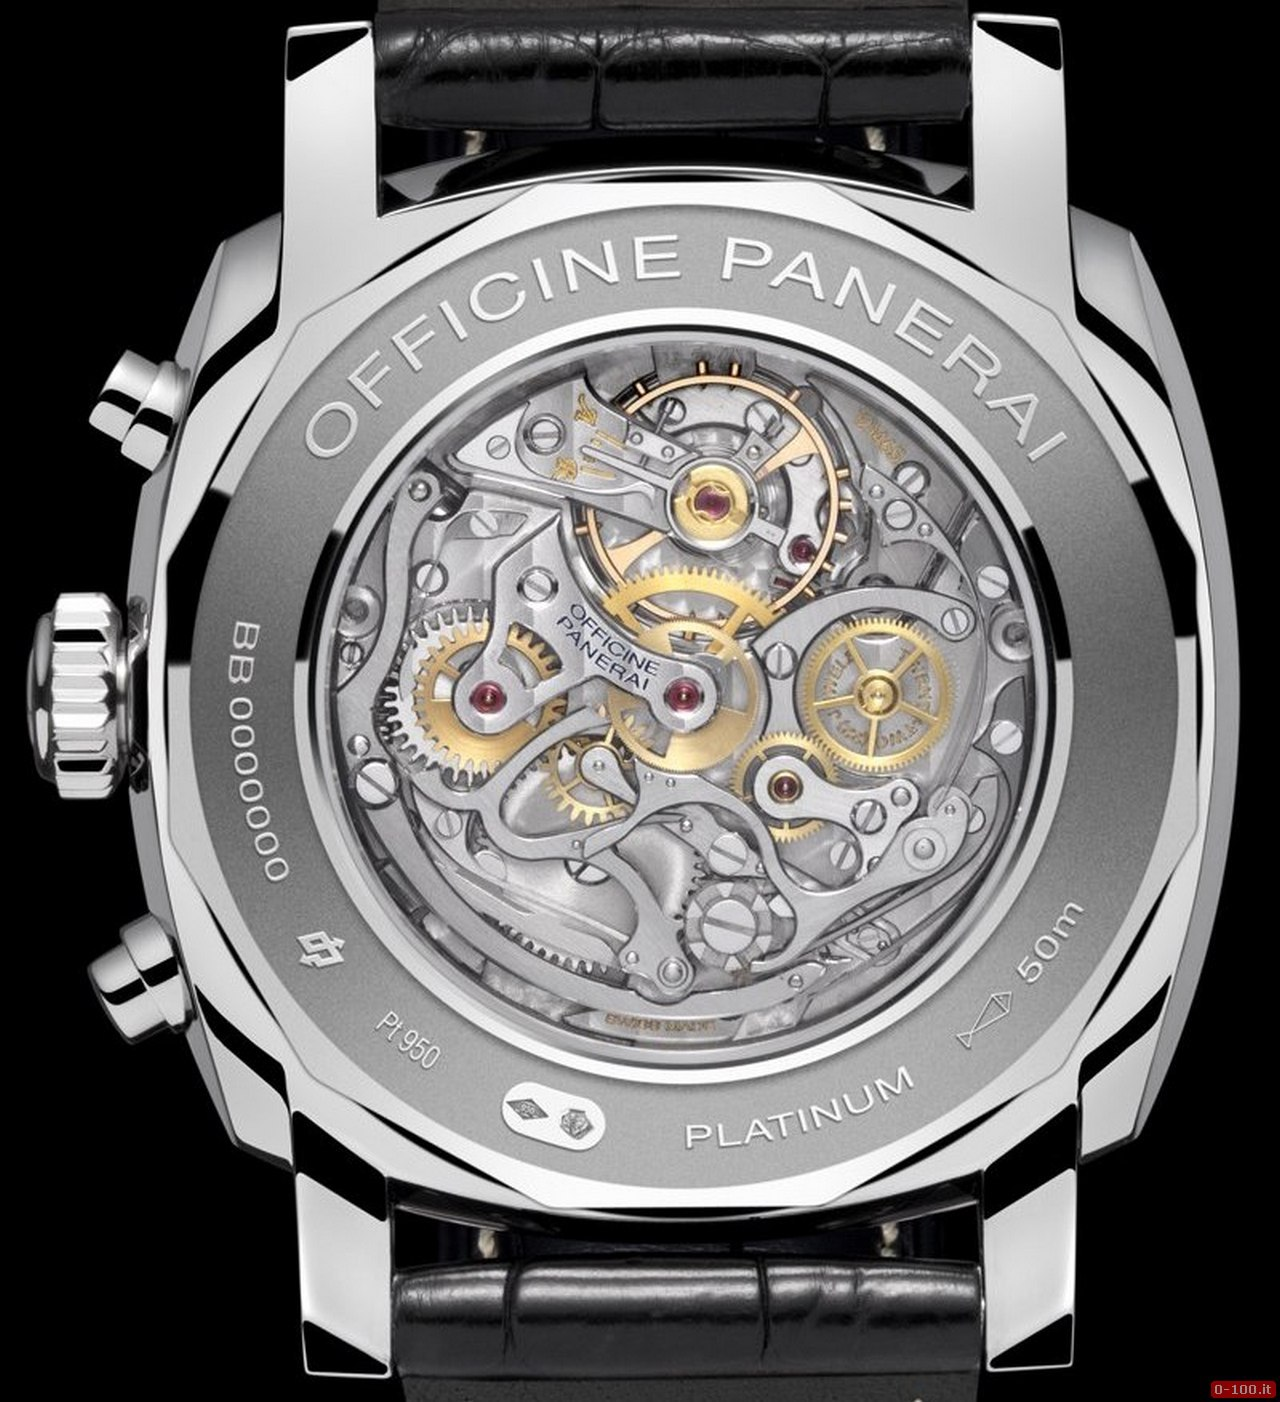 sihh-2014-panerai-radiomir-1940-chronograph-collection-limited-edition_0-100_9